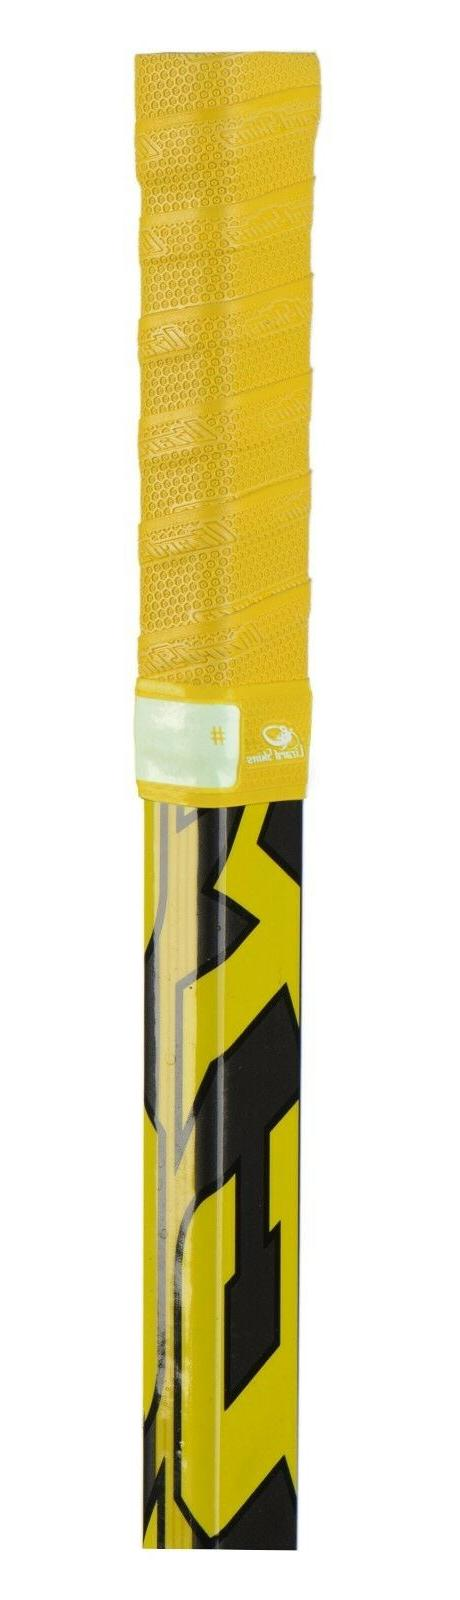 Lizard Skins Hockey Stick Grip Tape Colors -